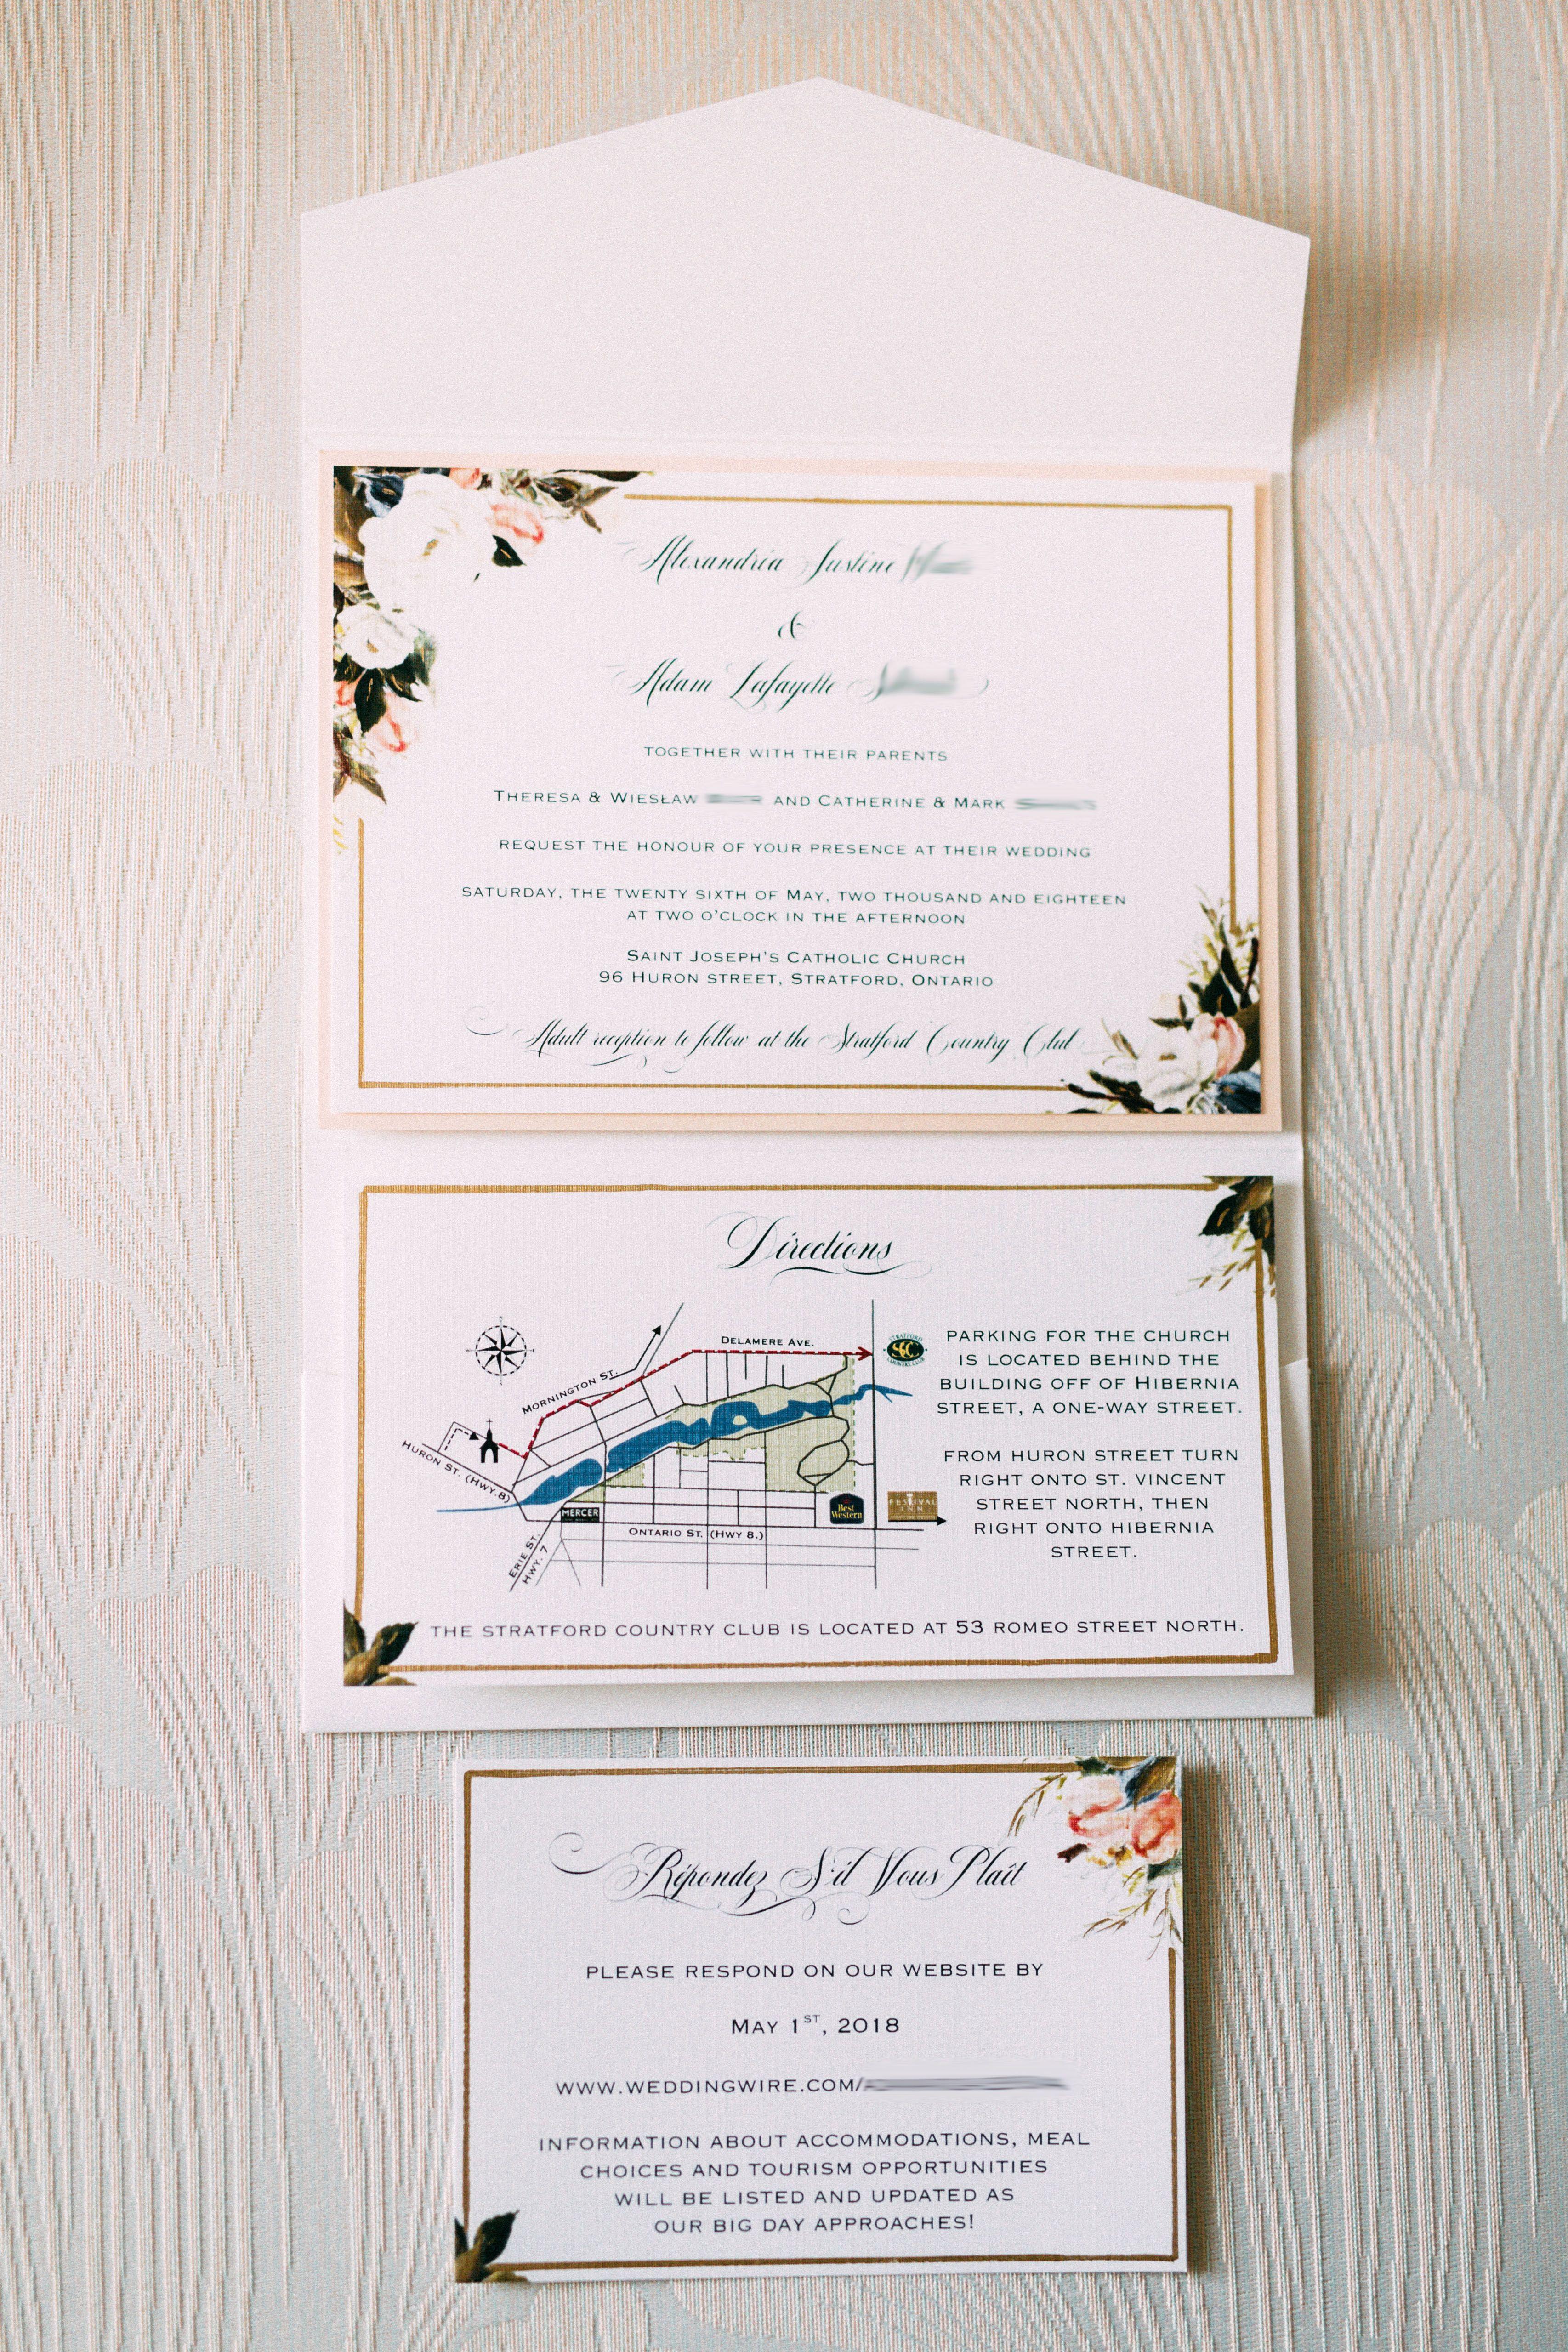 My Diy Story Ivory Blush Floral Pocket Invitation Cards Pockets Design Idea Blog Pocket Wedding Invitations Cheap Wedding Invitations Wedding Invitations